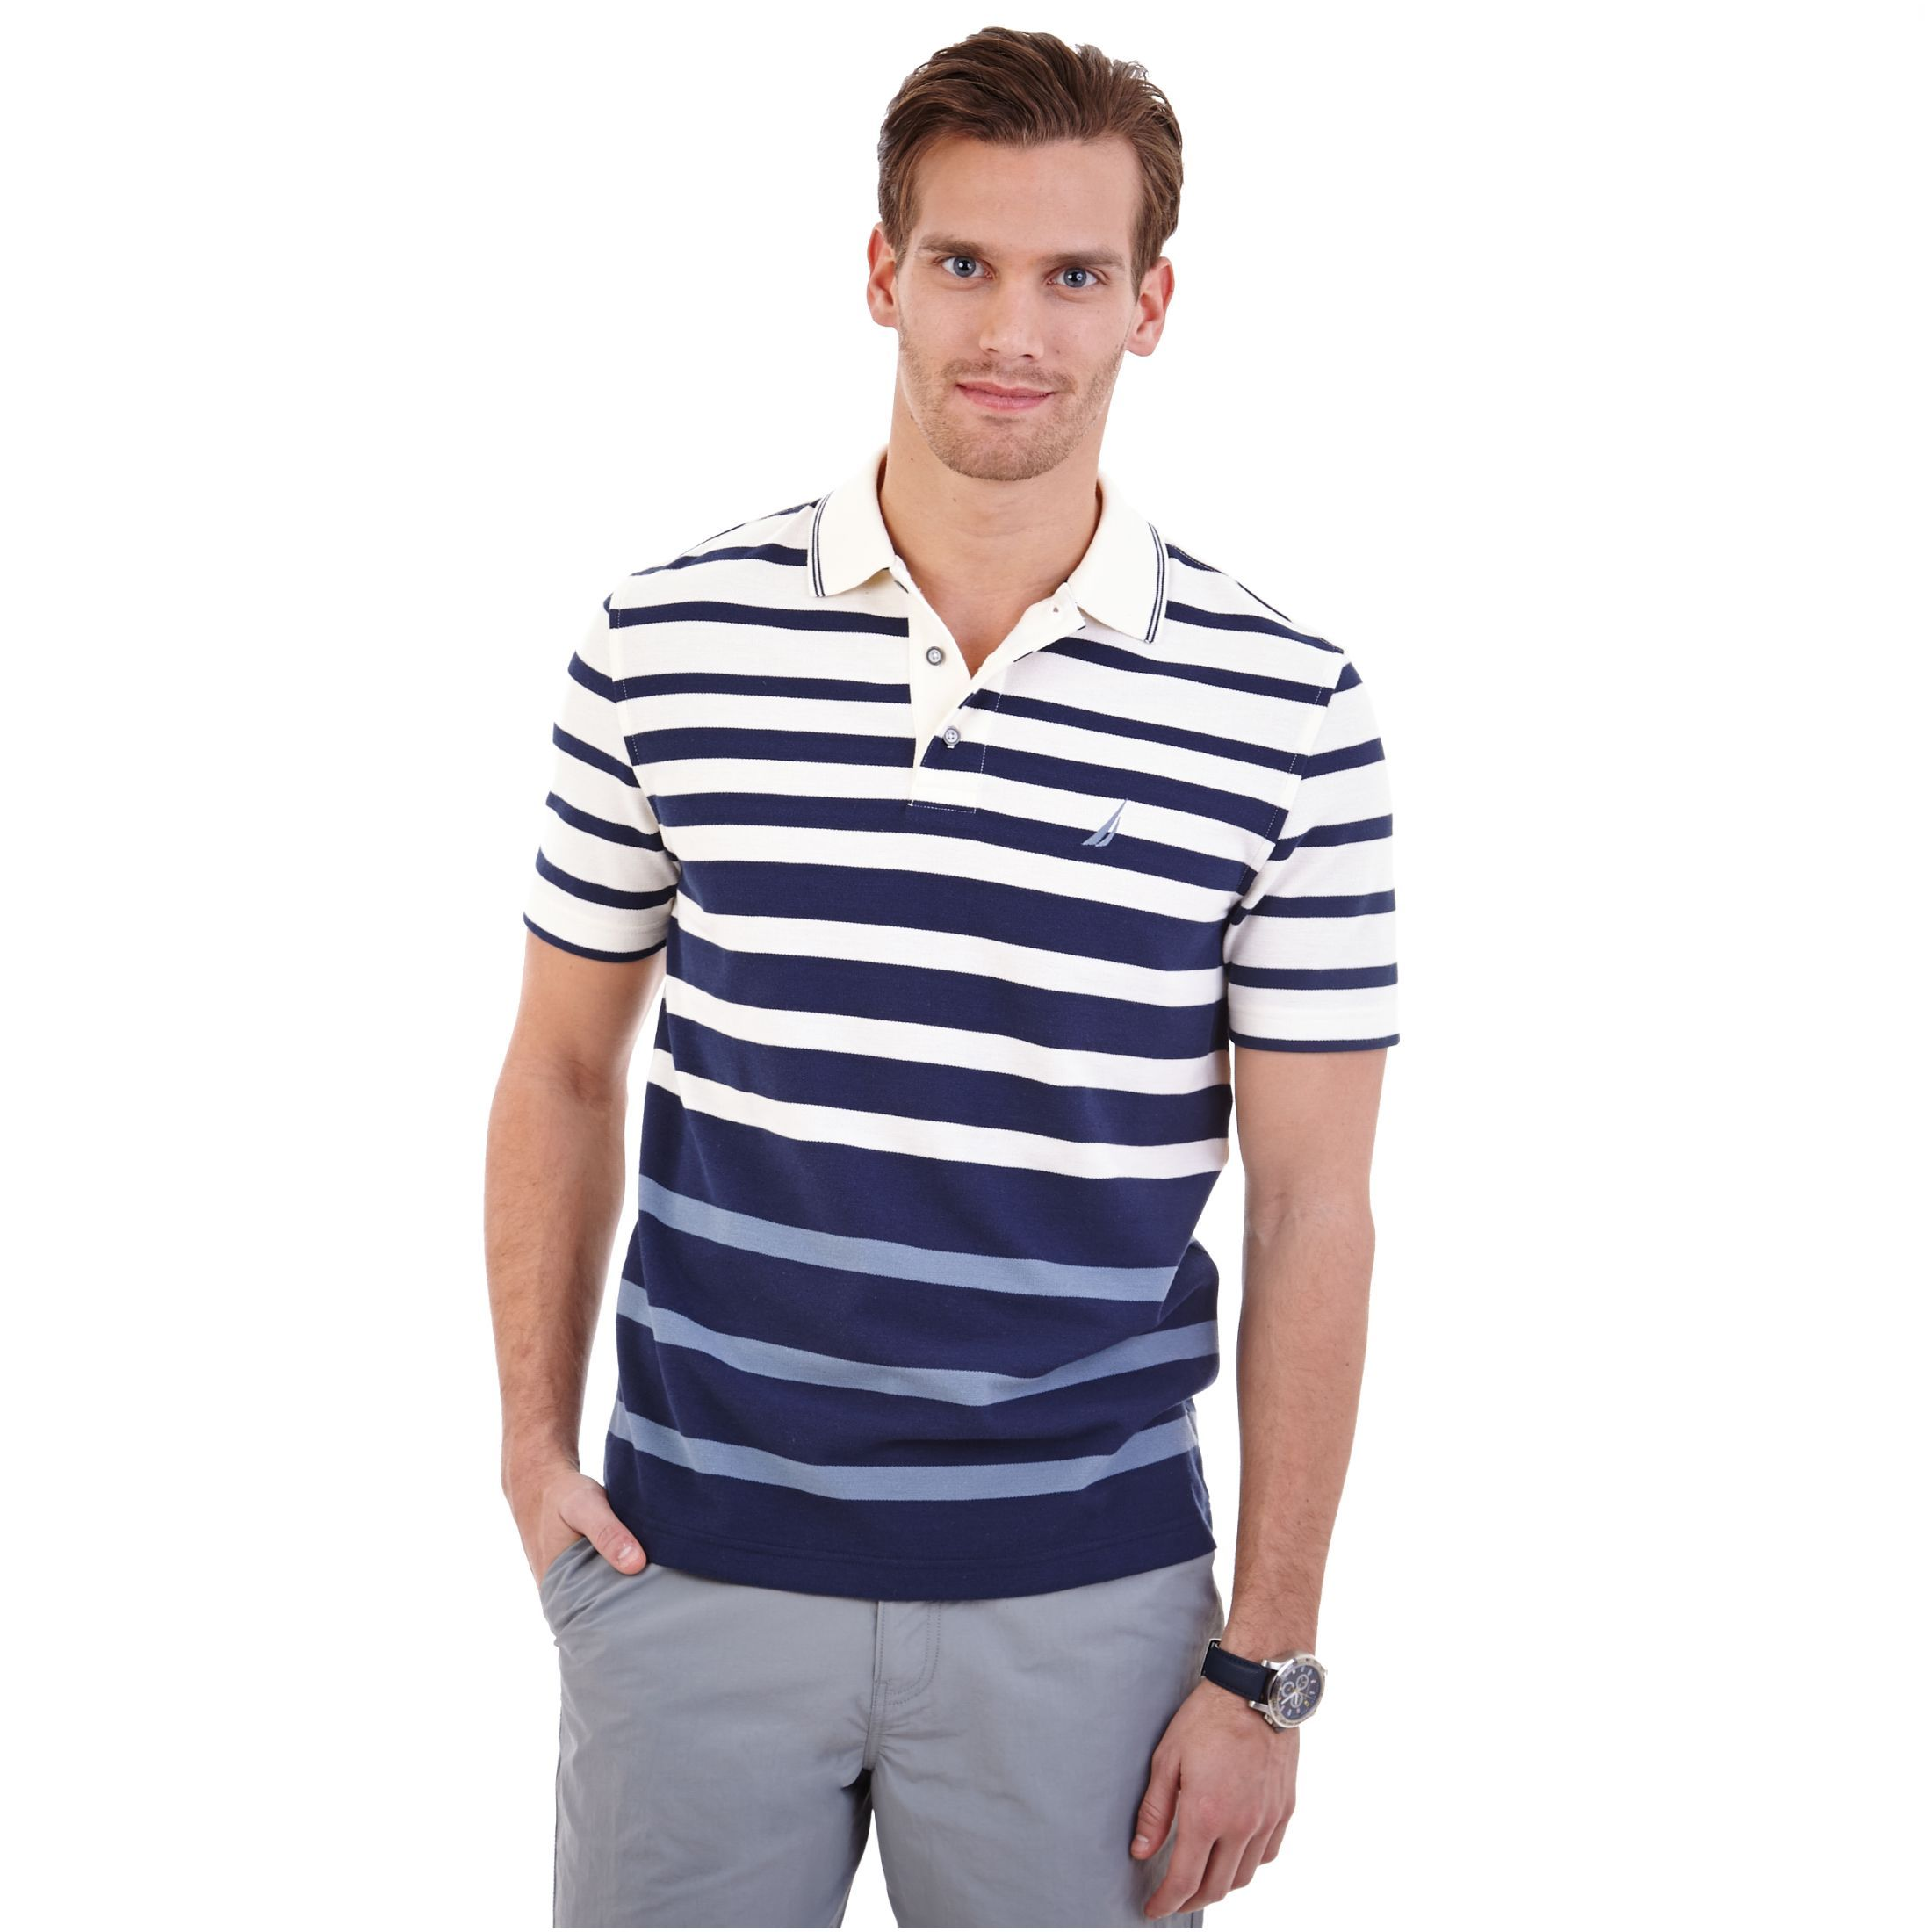 Engineered Stripe Performance Deck Polo Shirt - Nautica